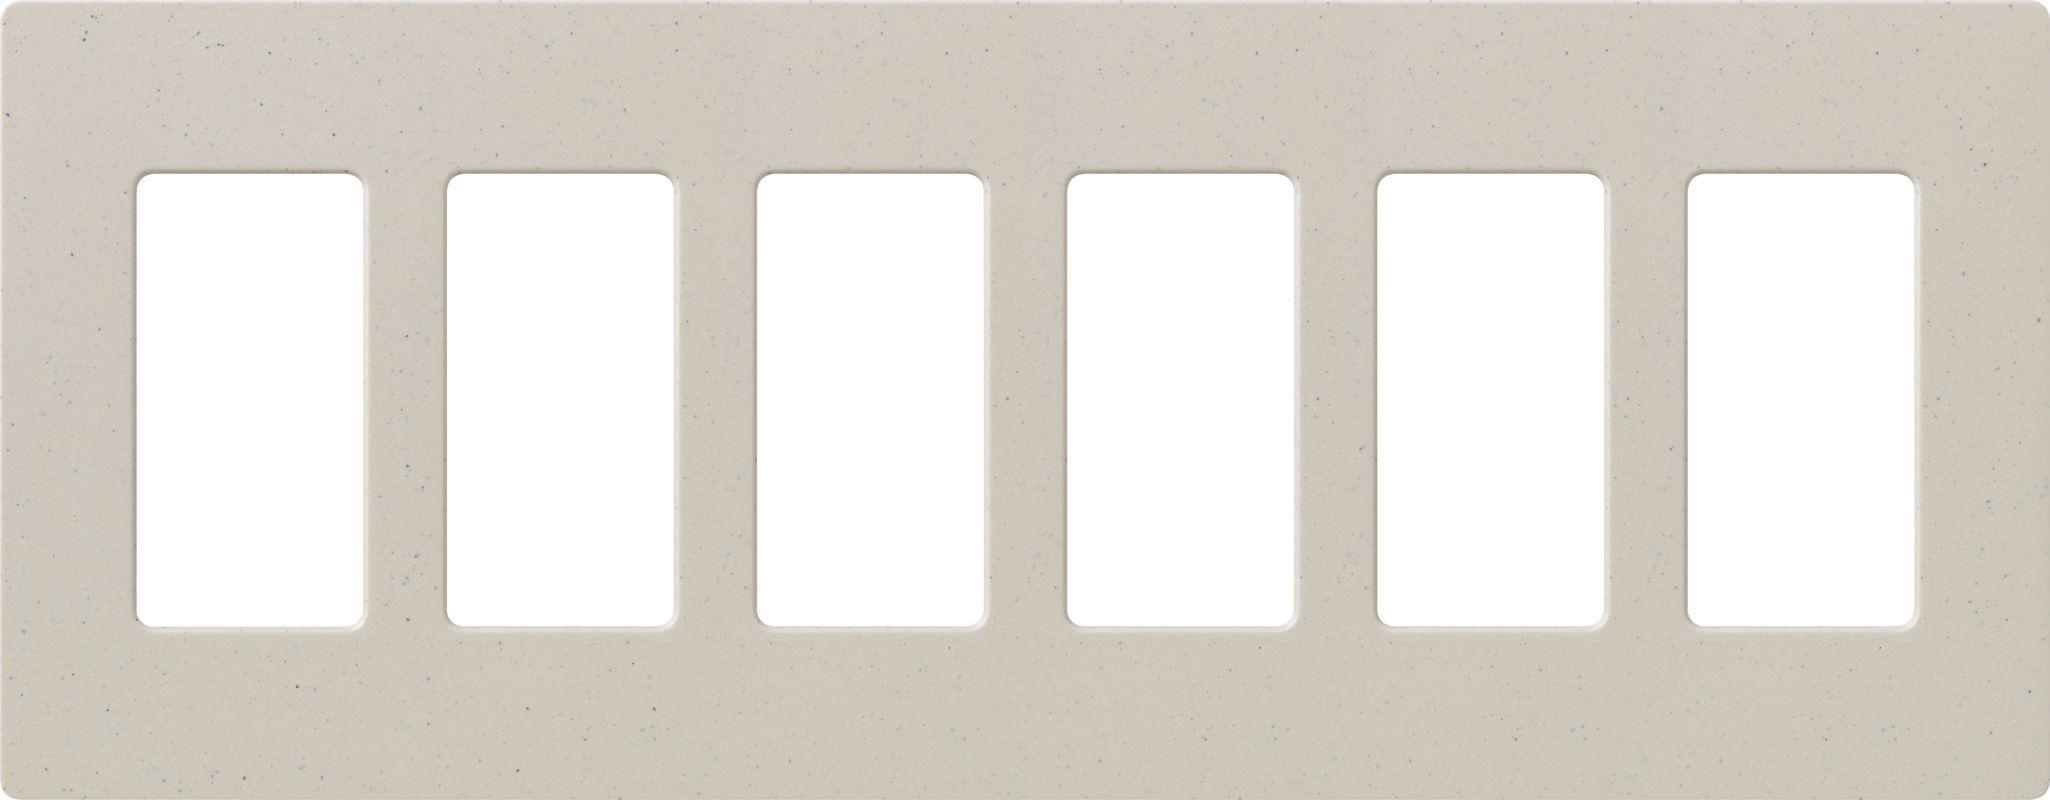 Lutron CW-6 Claro Six Gang Designer Wall Plate Limestone Wall Controls Sale $59.75 ITEM: bci1856037 ID#:SC-6-LS UPC: 27557494786 :